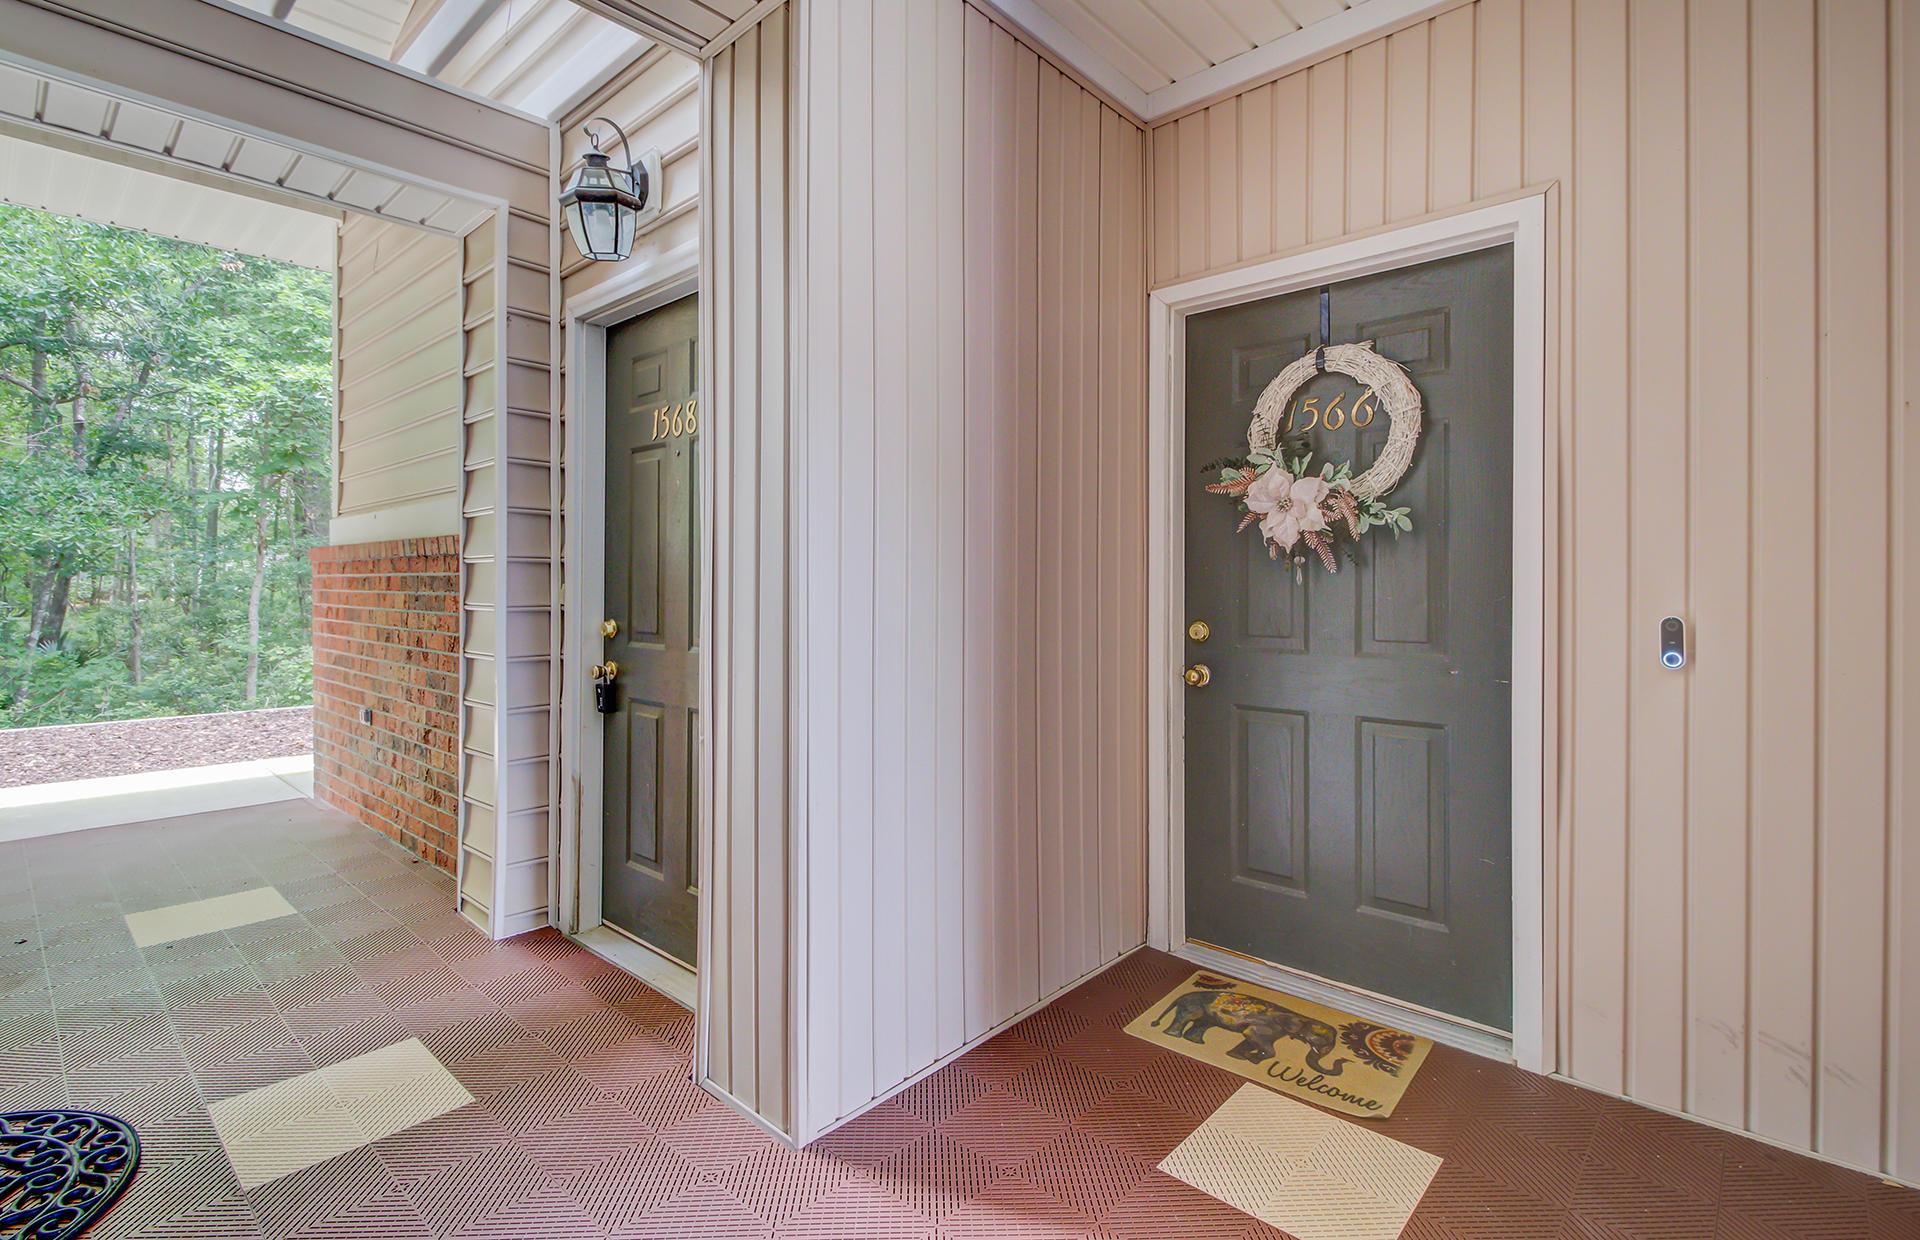 Dunes West Homes For Sale - 1566 Oxborough, Mount Pleasant, SC - 5